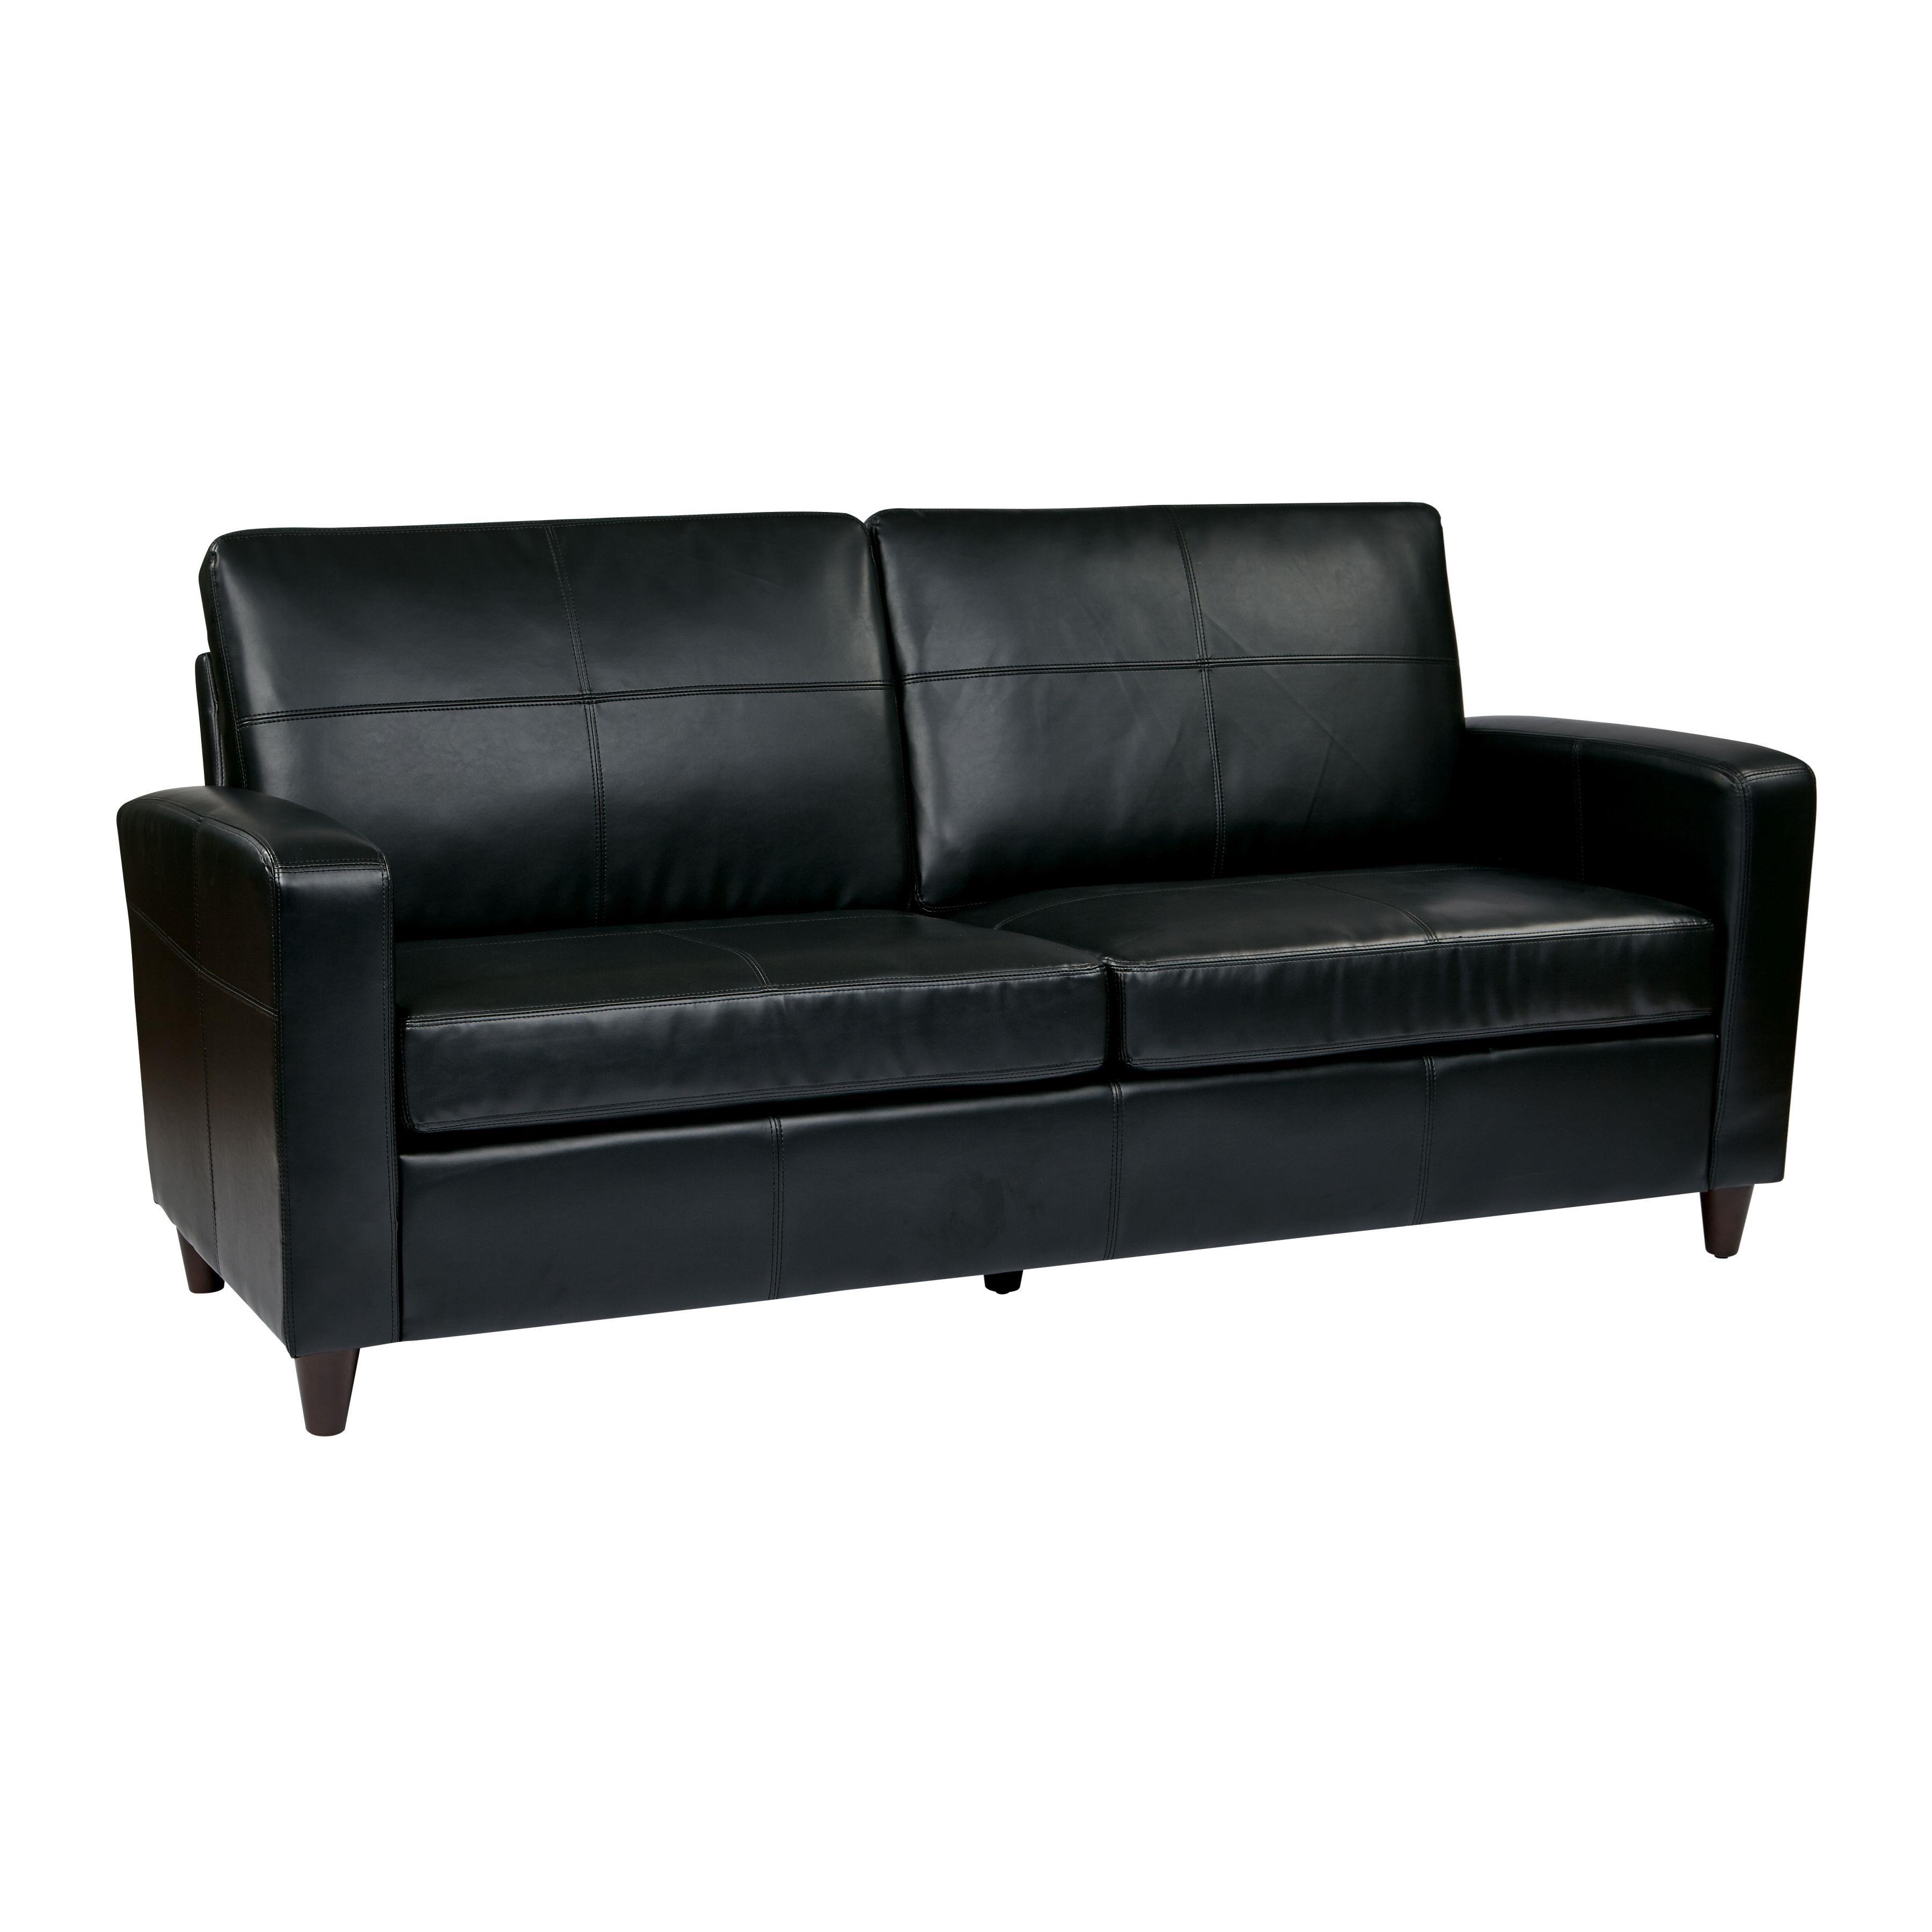 Osp espresso or black eco leather sofa with espresso finish ospsl2813